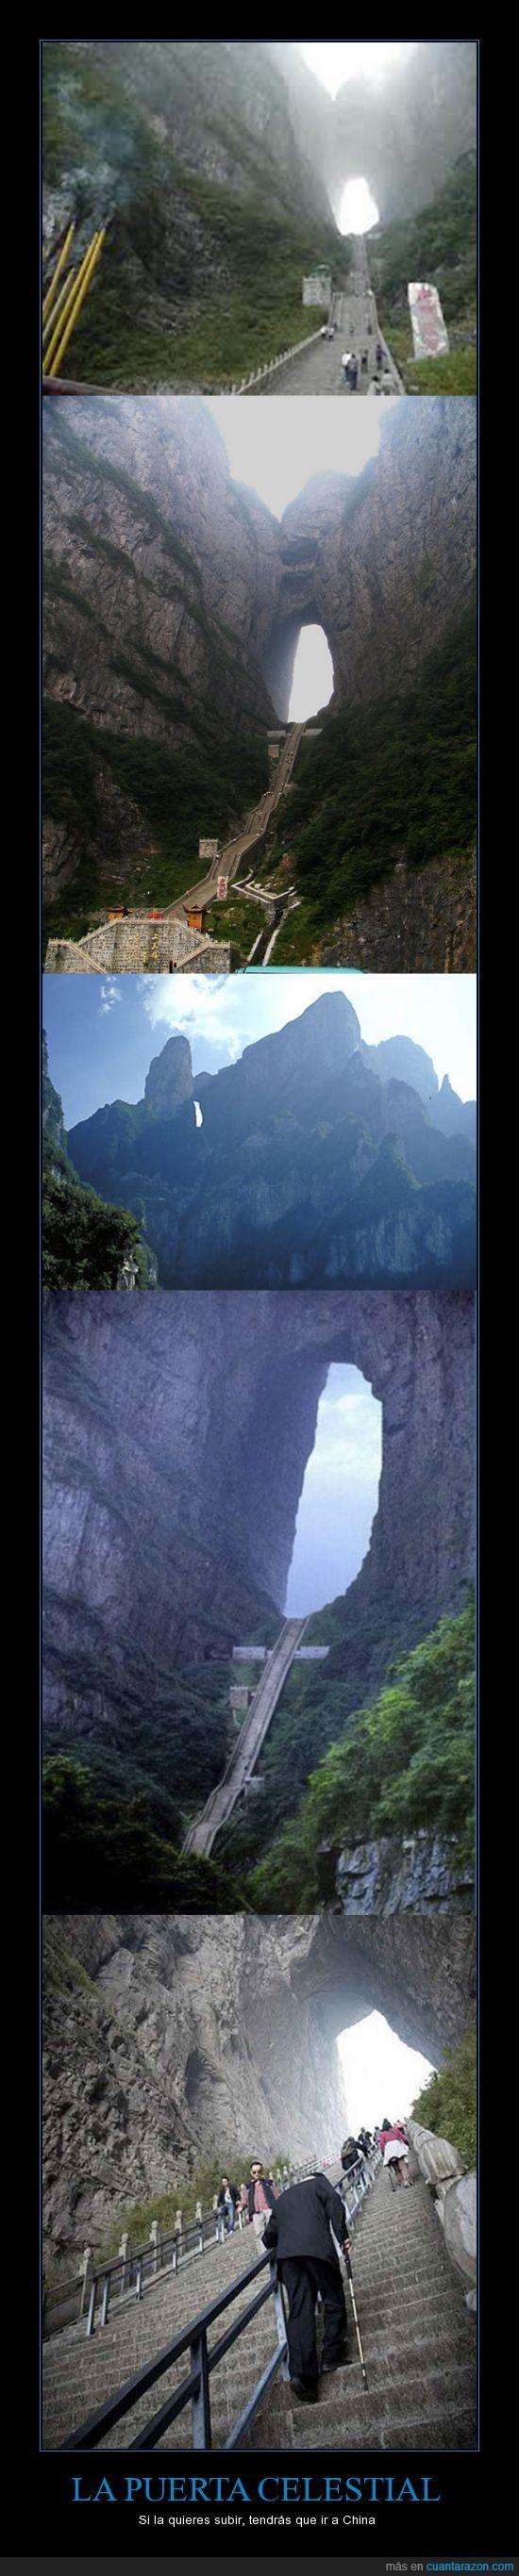 celestia,en china,encuentra,la,puerta,se